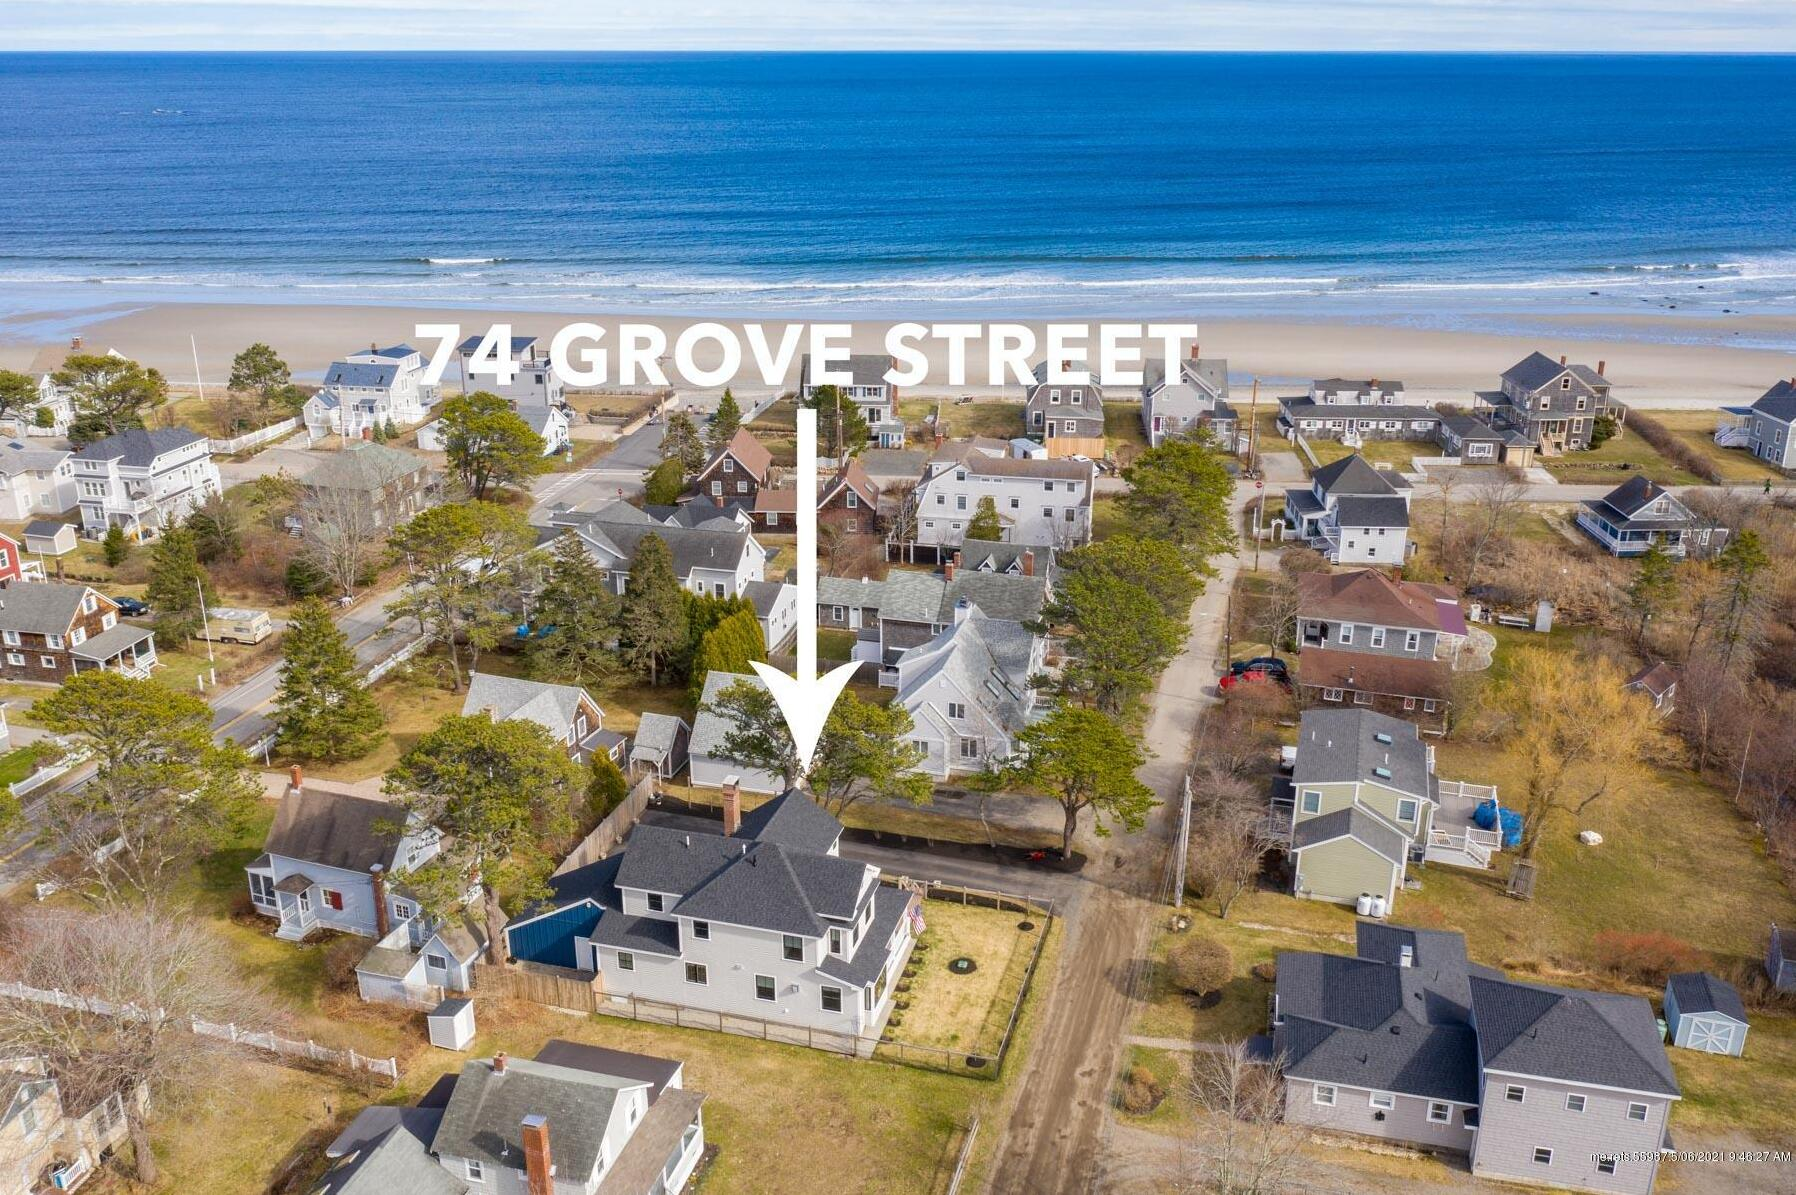 Photo of 74 Grove Street Wells ME 04090